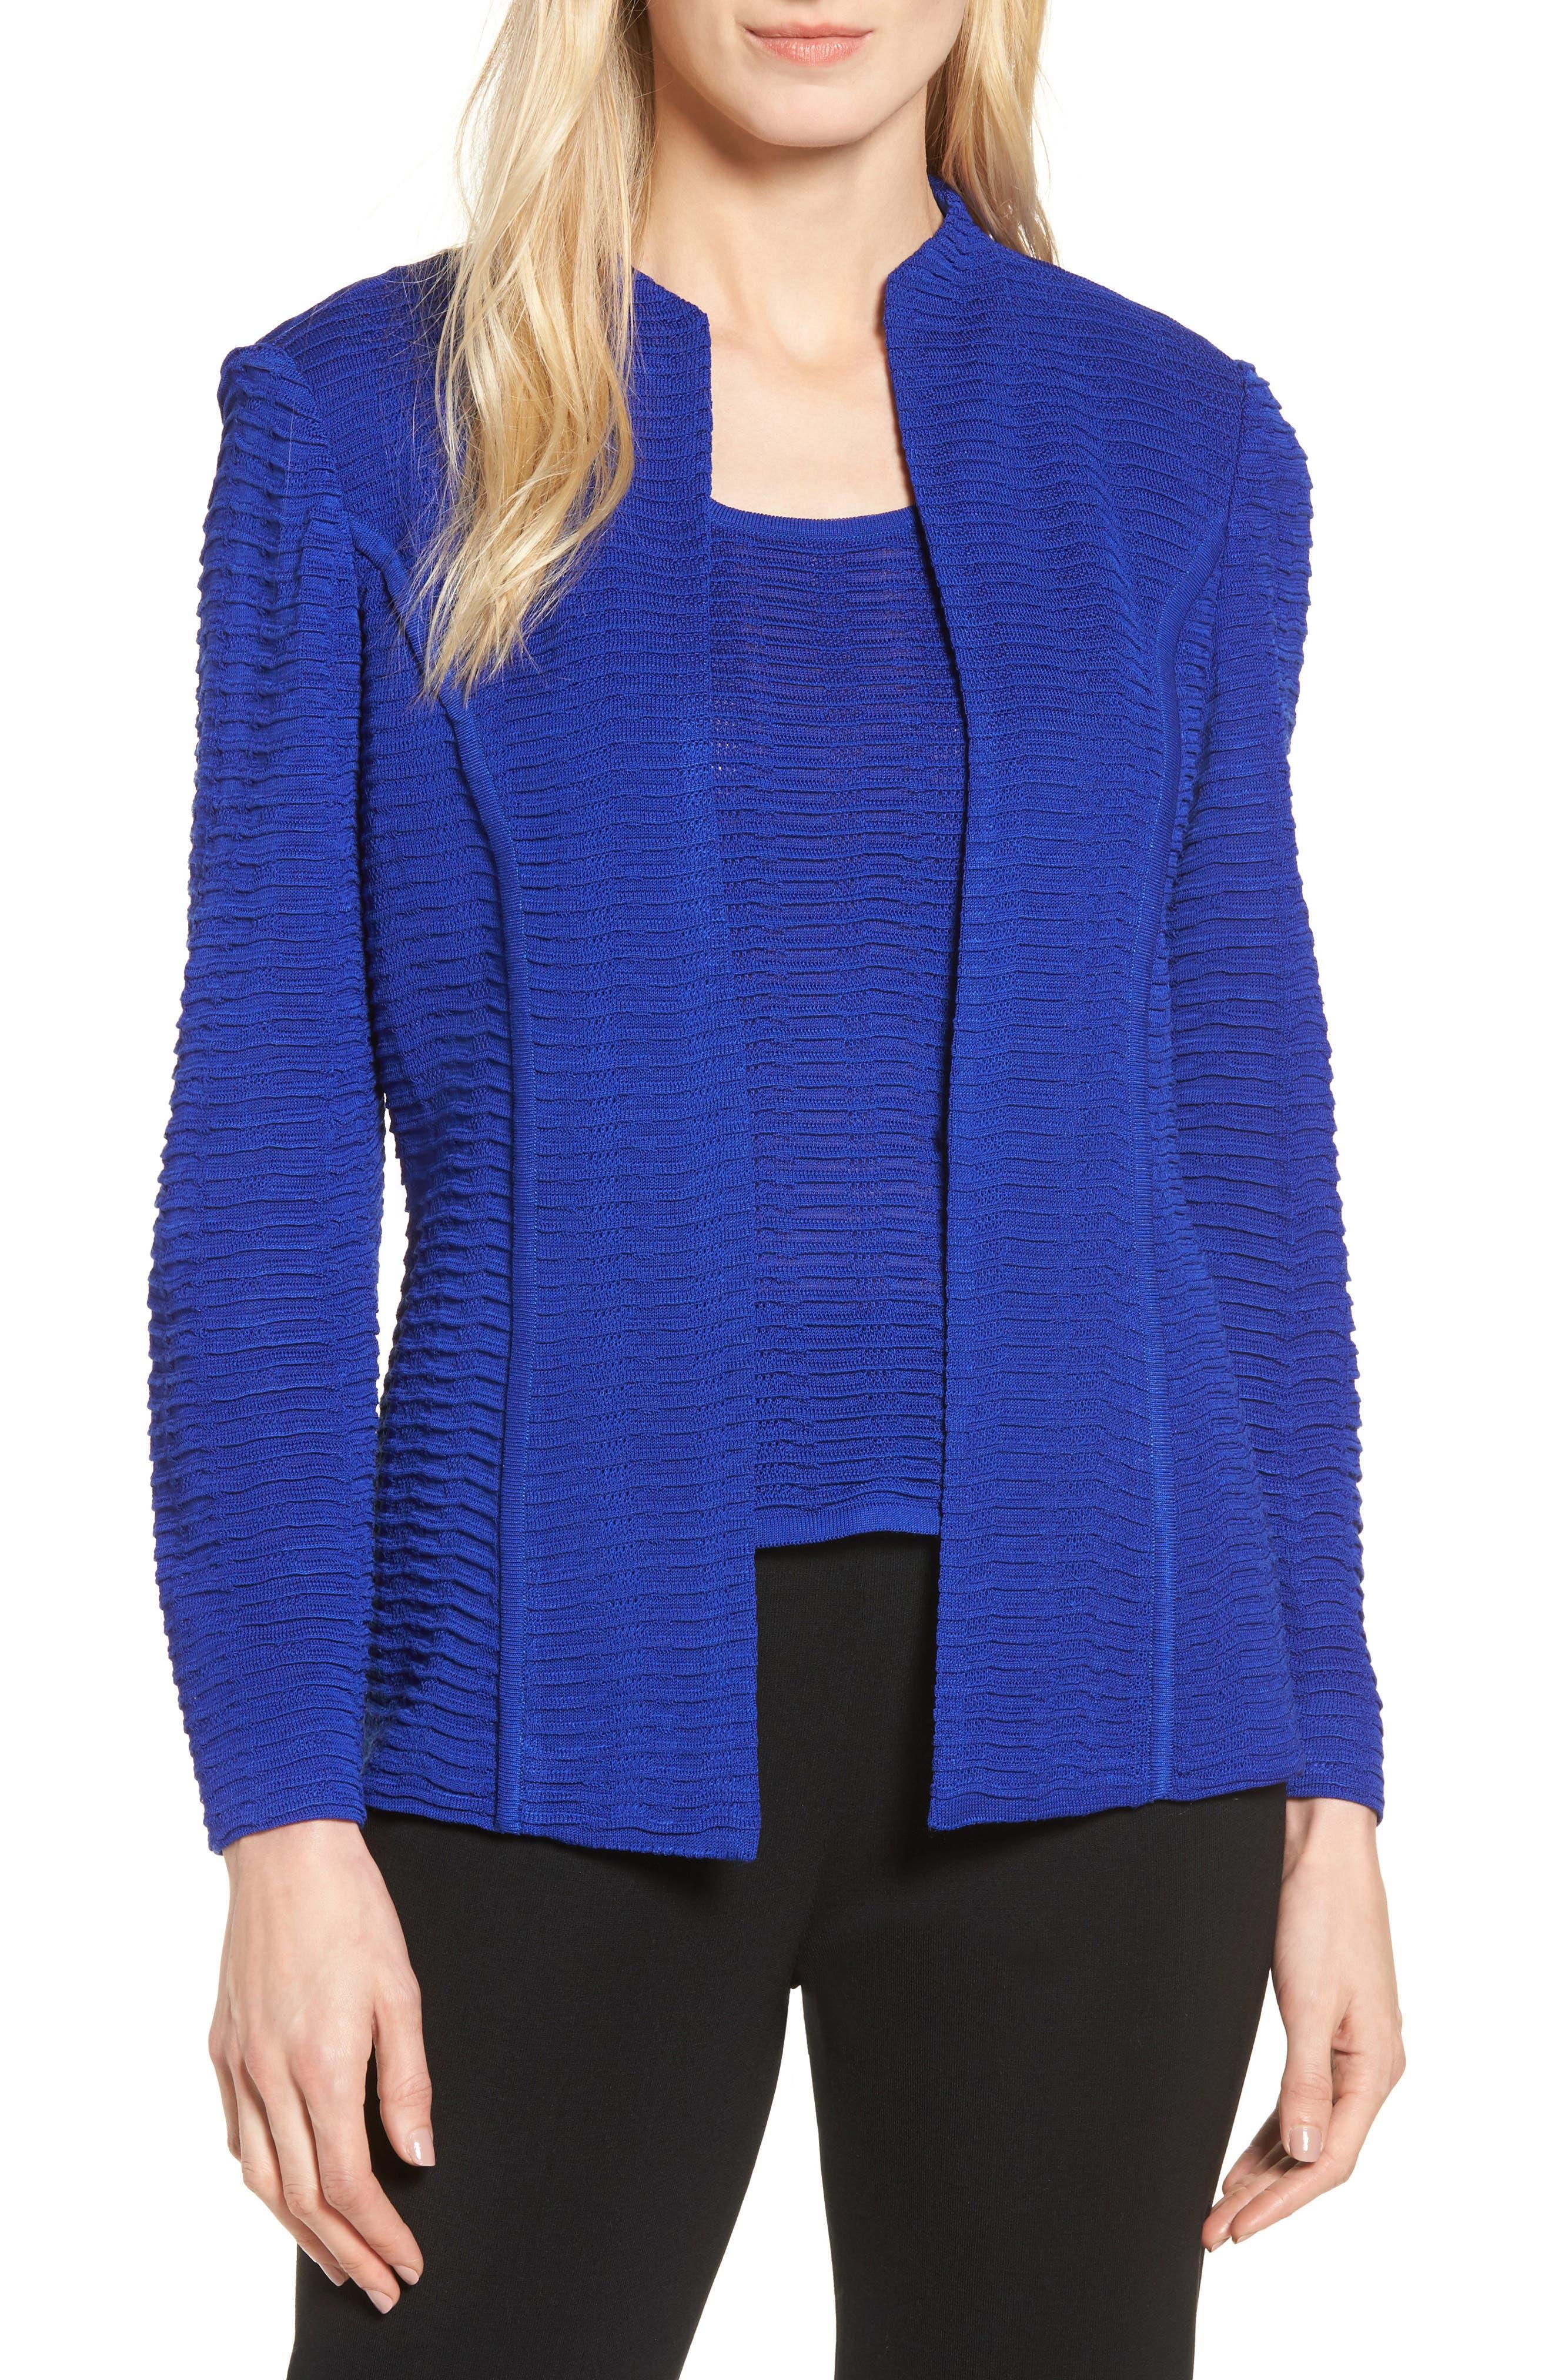 Ripple Knit Jacket,                             Main thumbnail 1, color,                             Blue Flame